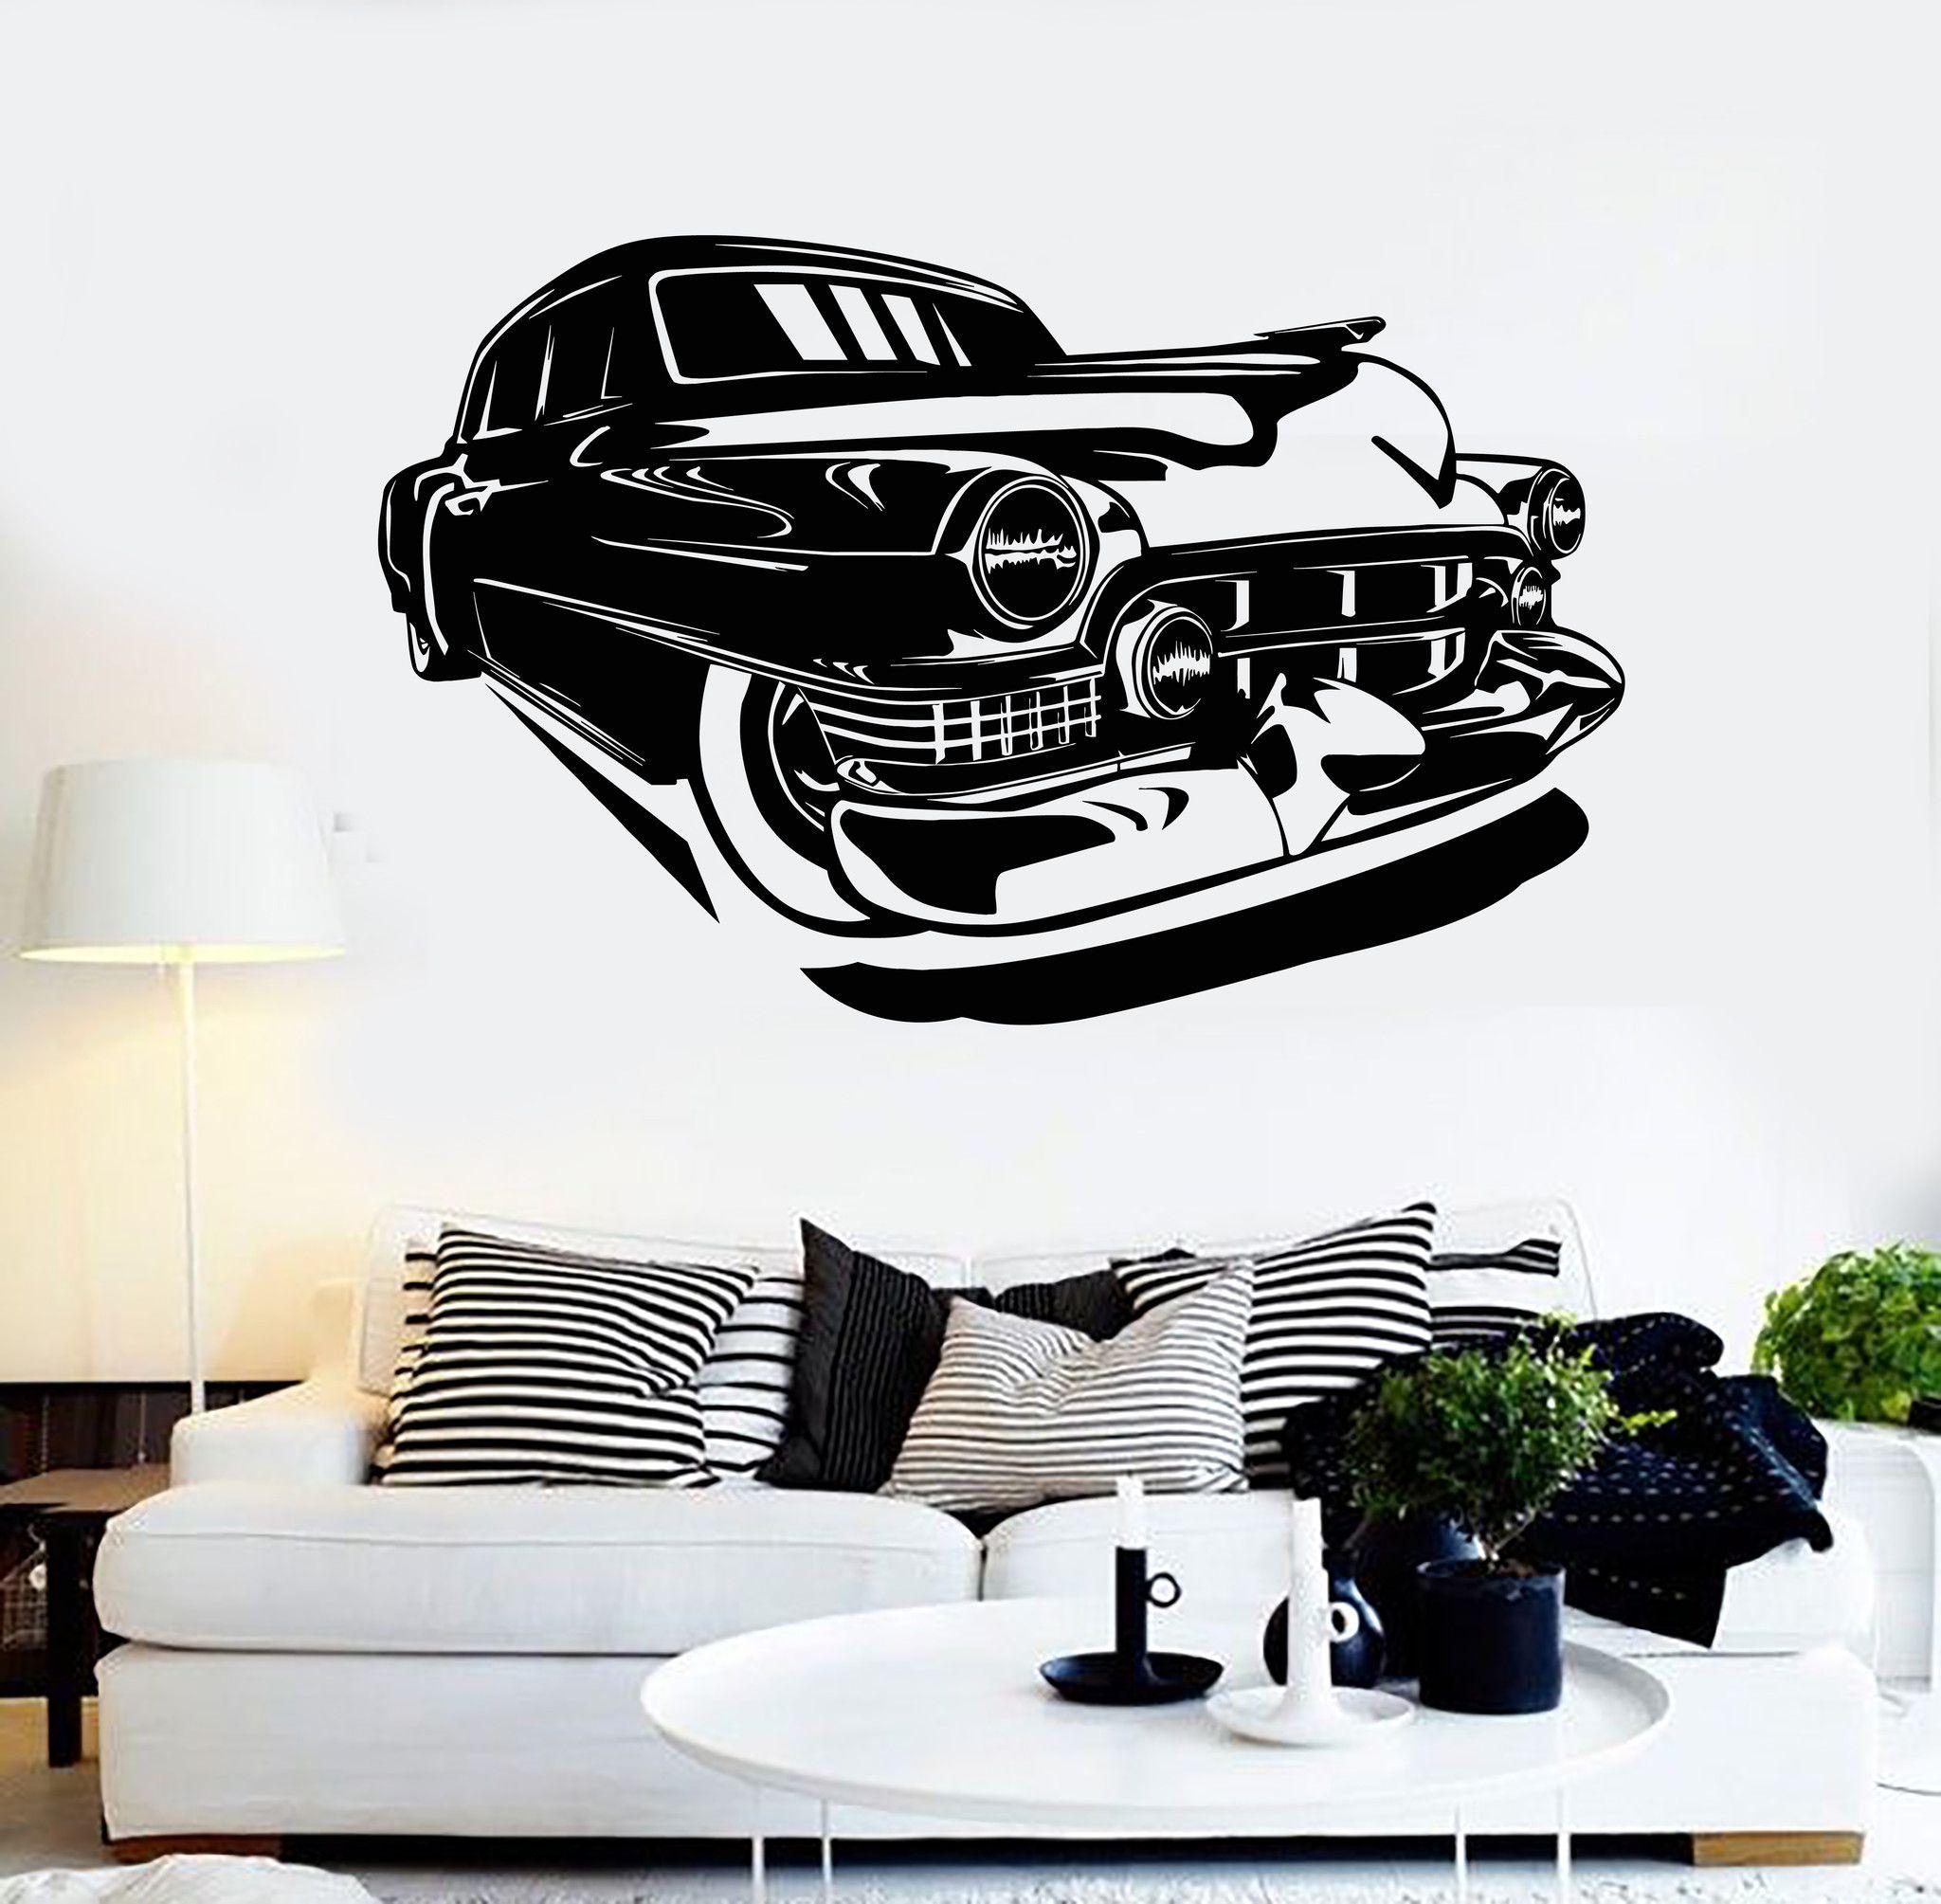 Vinyl Wall Decal Vintage Old Car Garage Decor Stickers Mural - Custom vinyl wall decals for garage